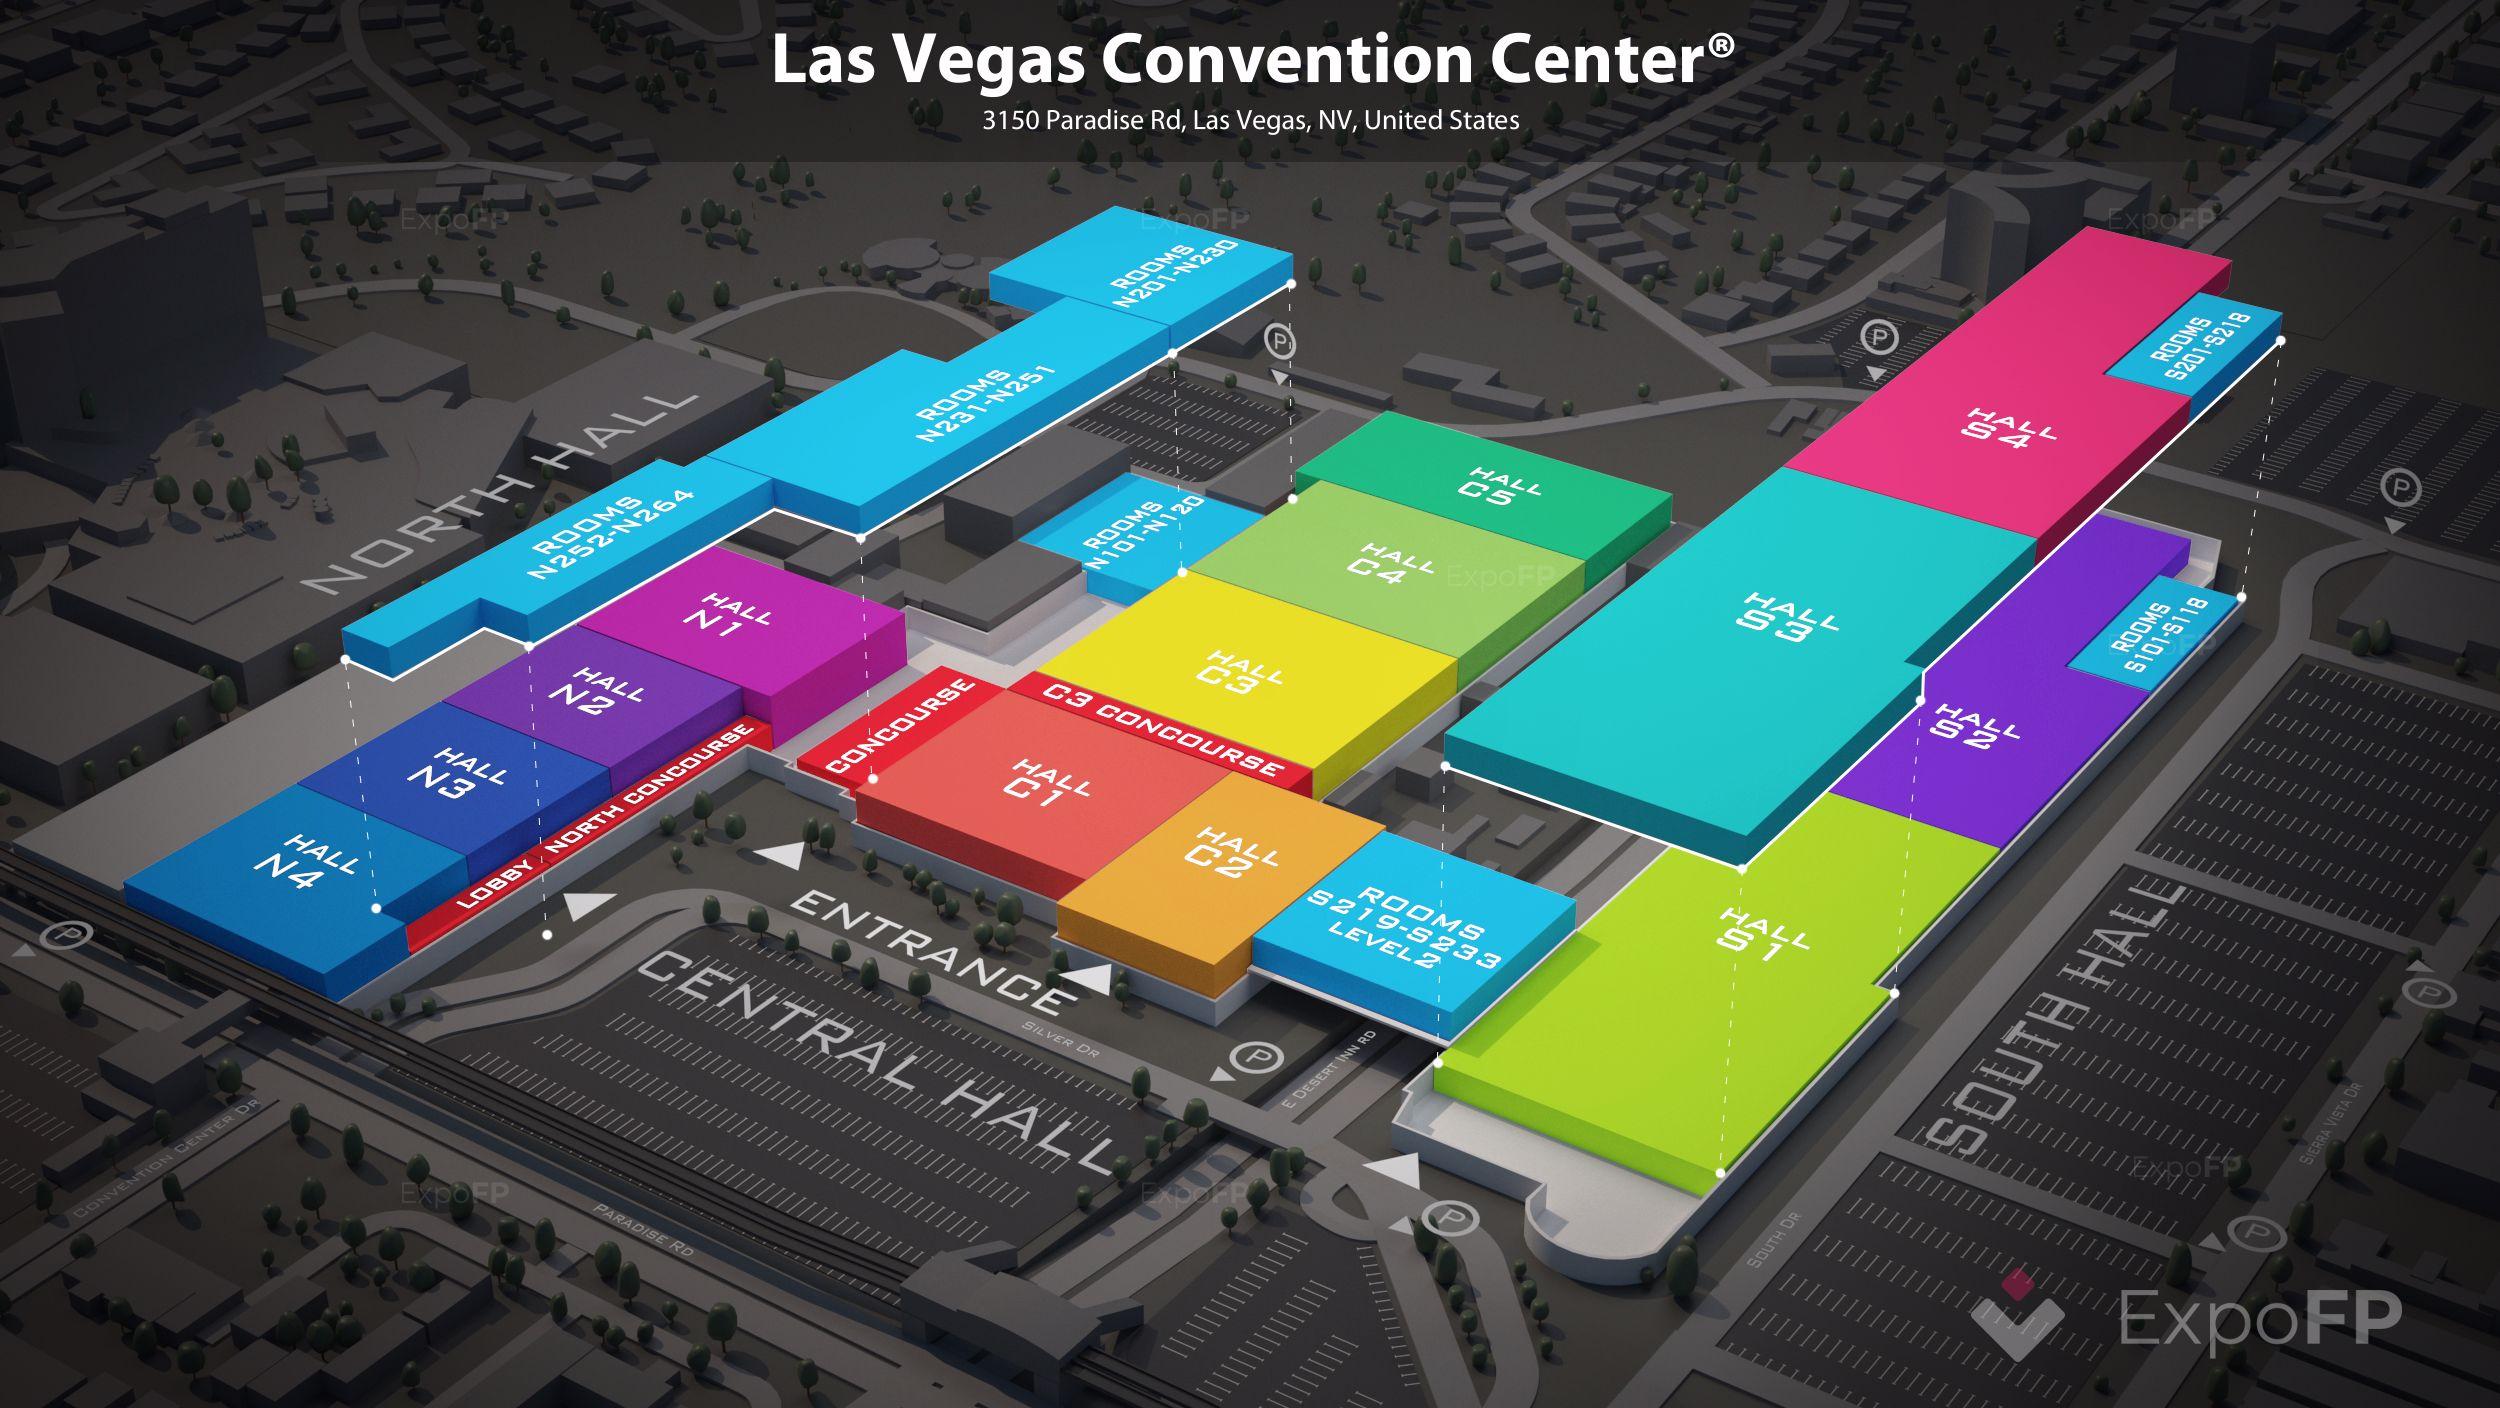 Nacs show 2020 | national association of convenience stores | las vegas convention center floorplan | nacs show 2020 | national association of convenience stores